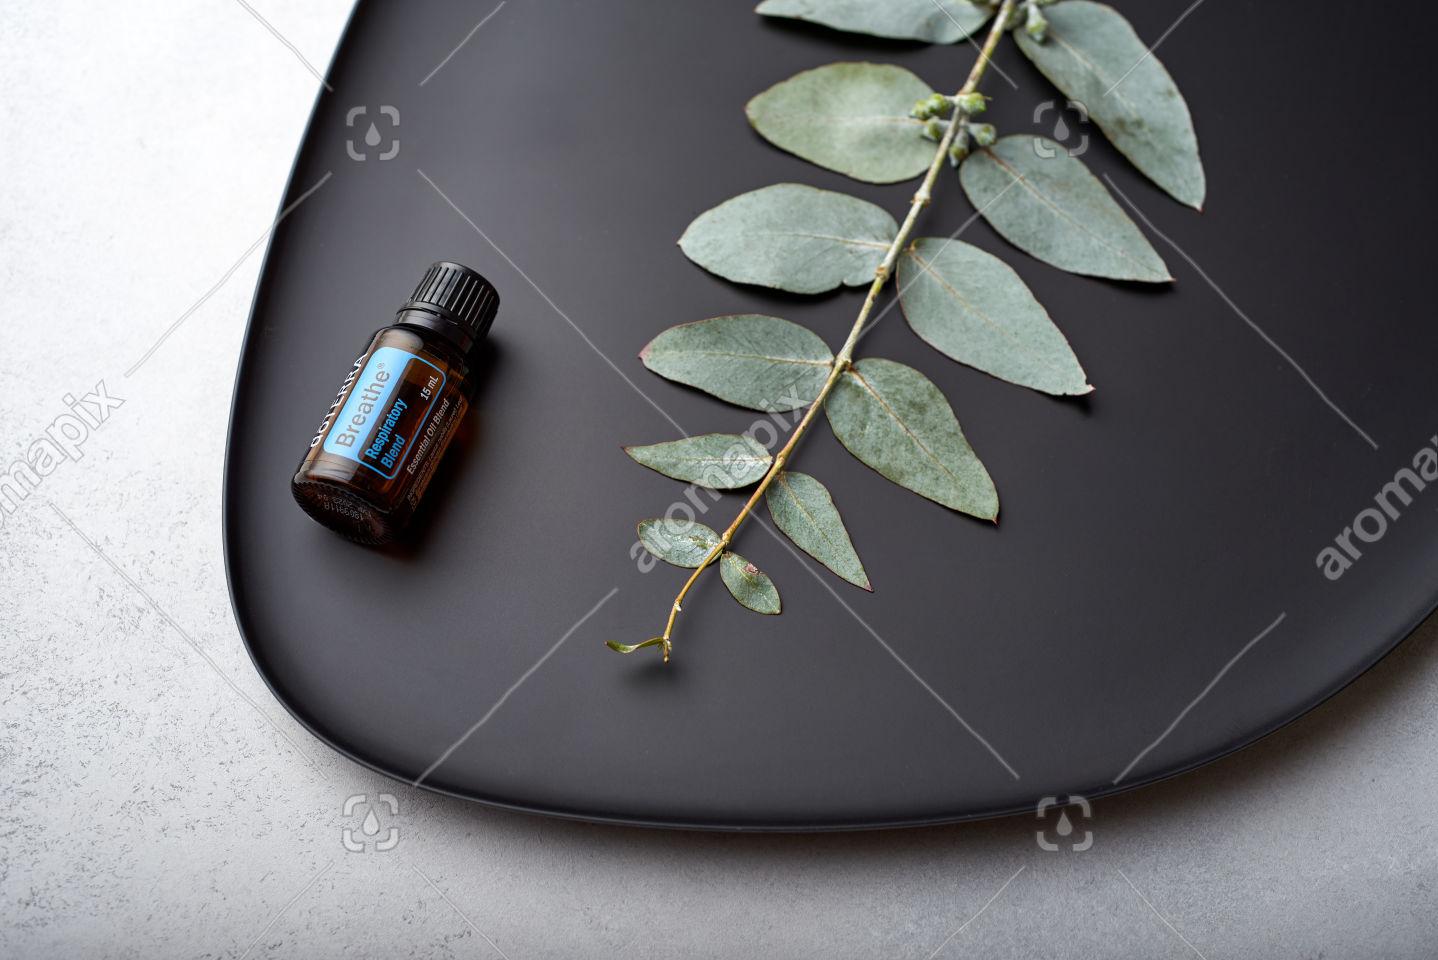 doTERRA Breathe and eucalyptus leaves on black plate